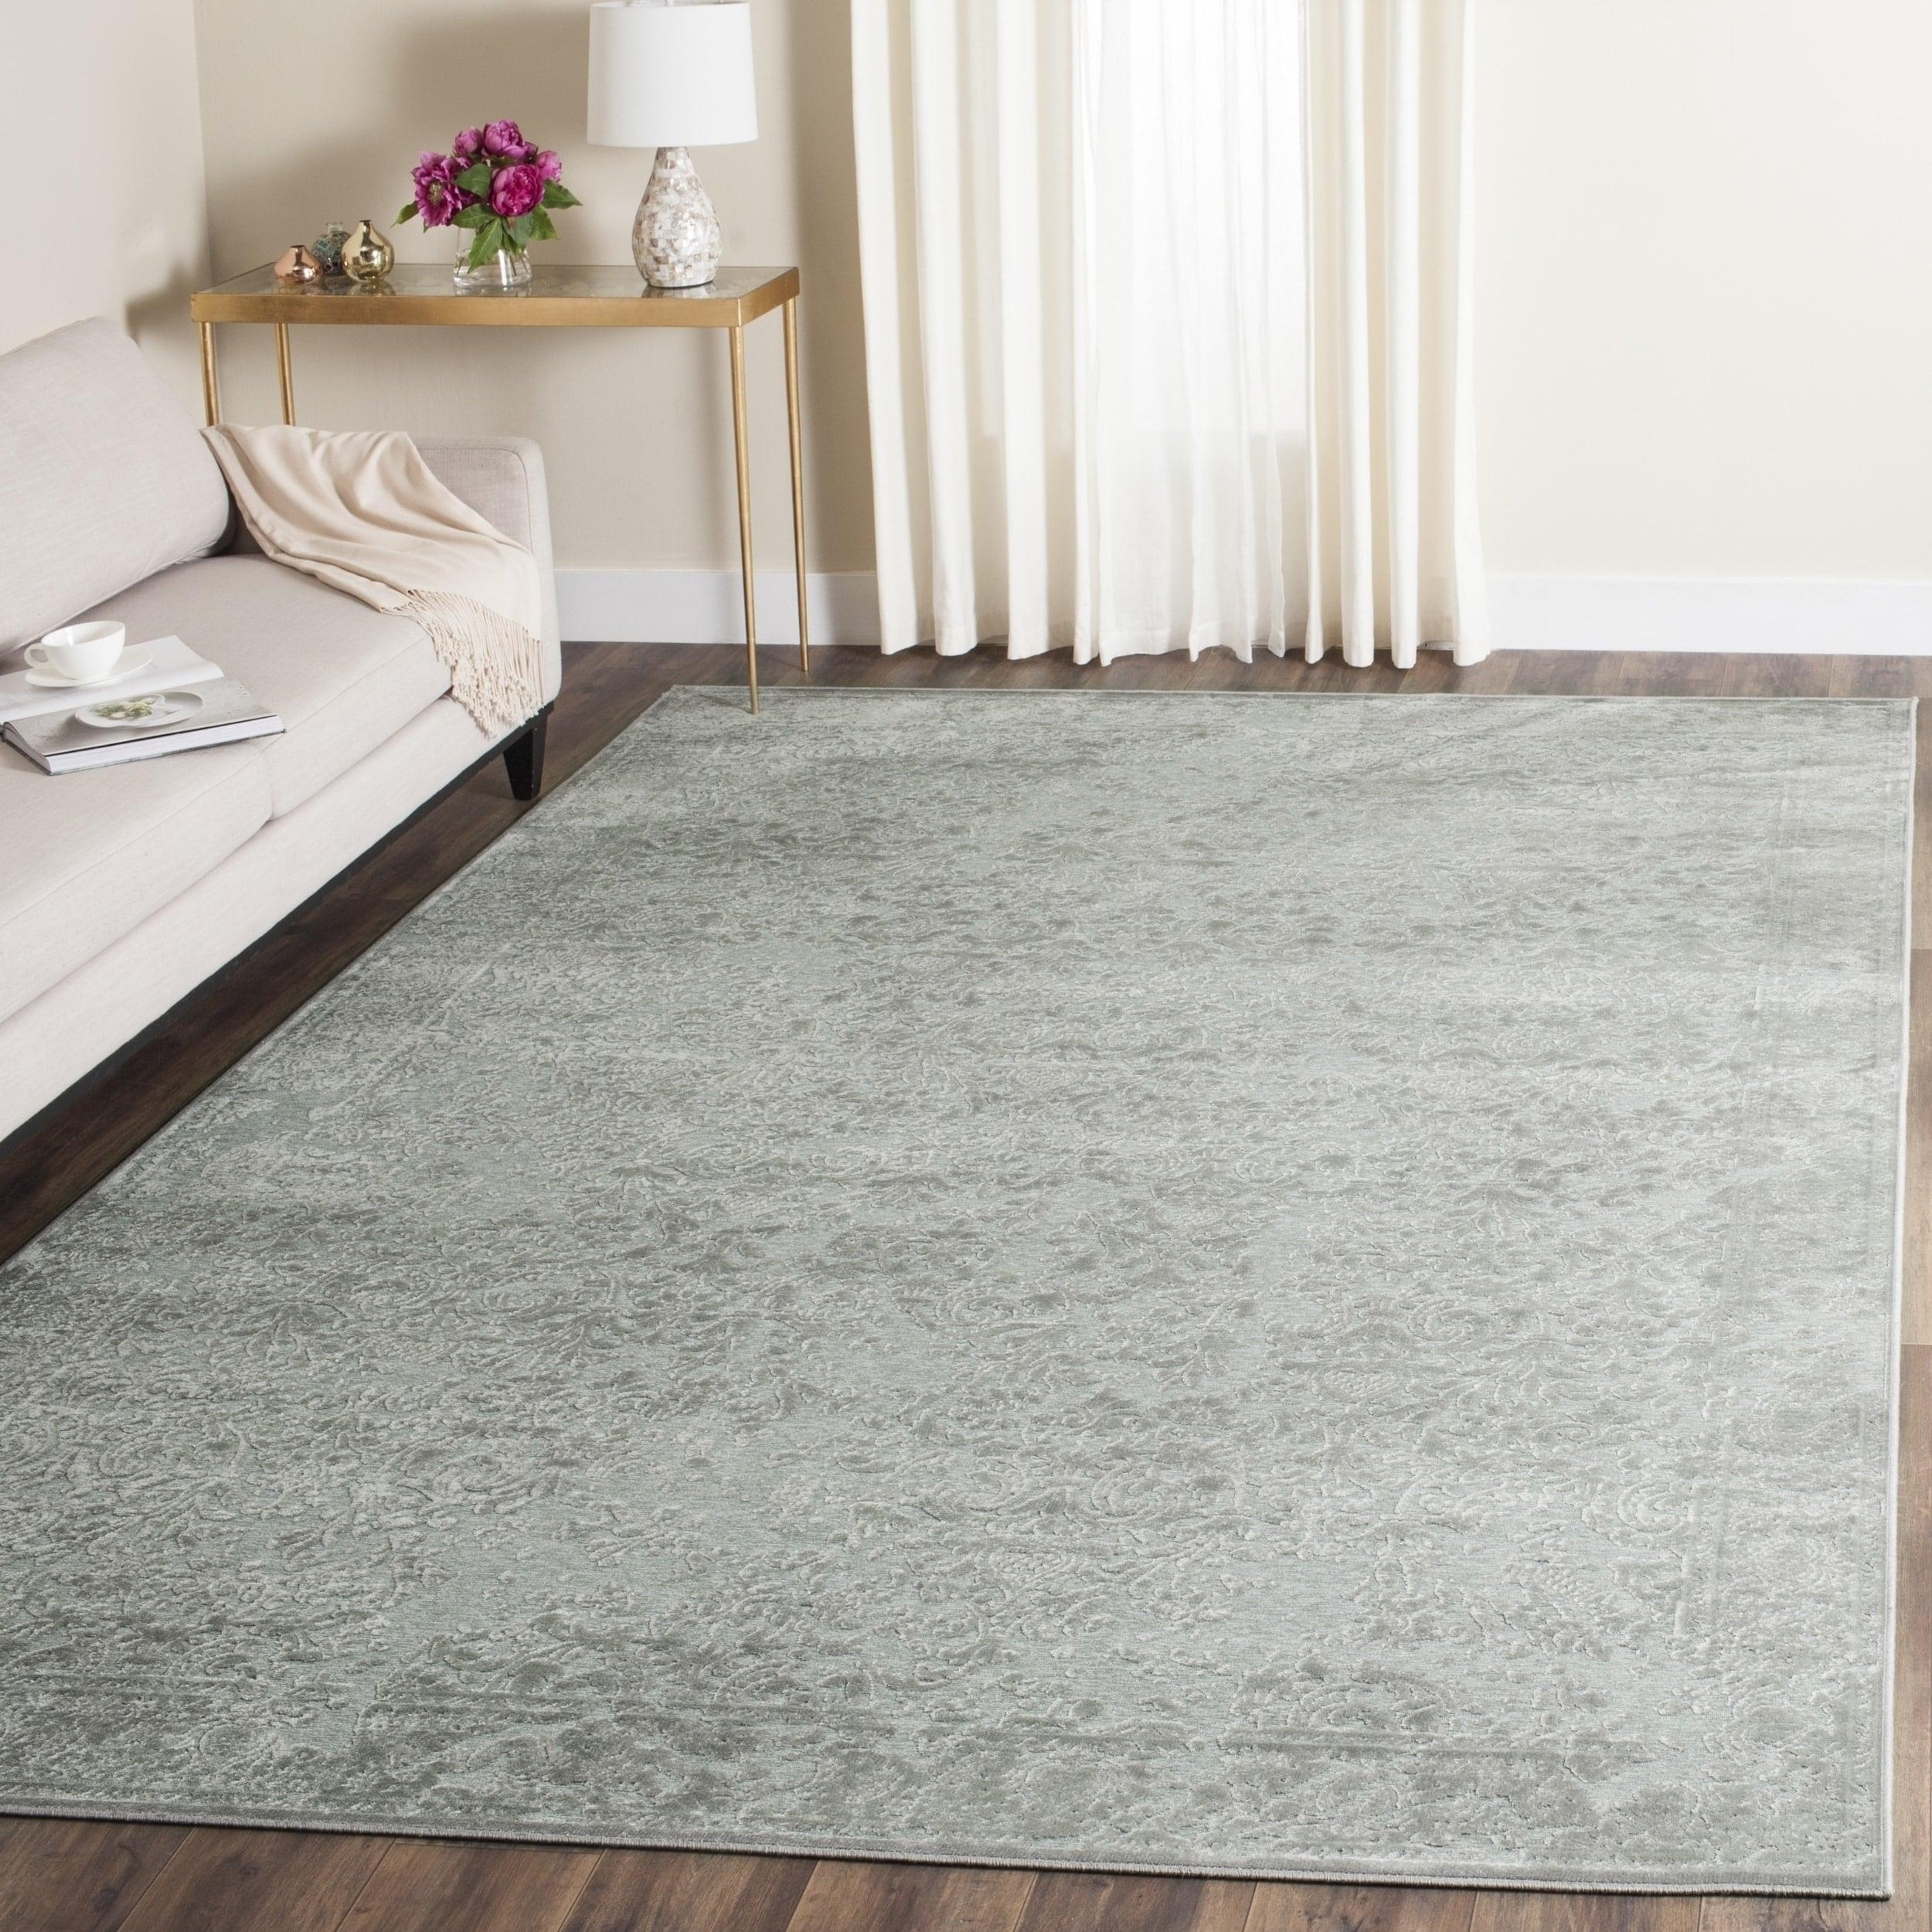 Safavieh paradise light grey spruce viscose rug 8 x 112